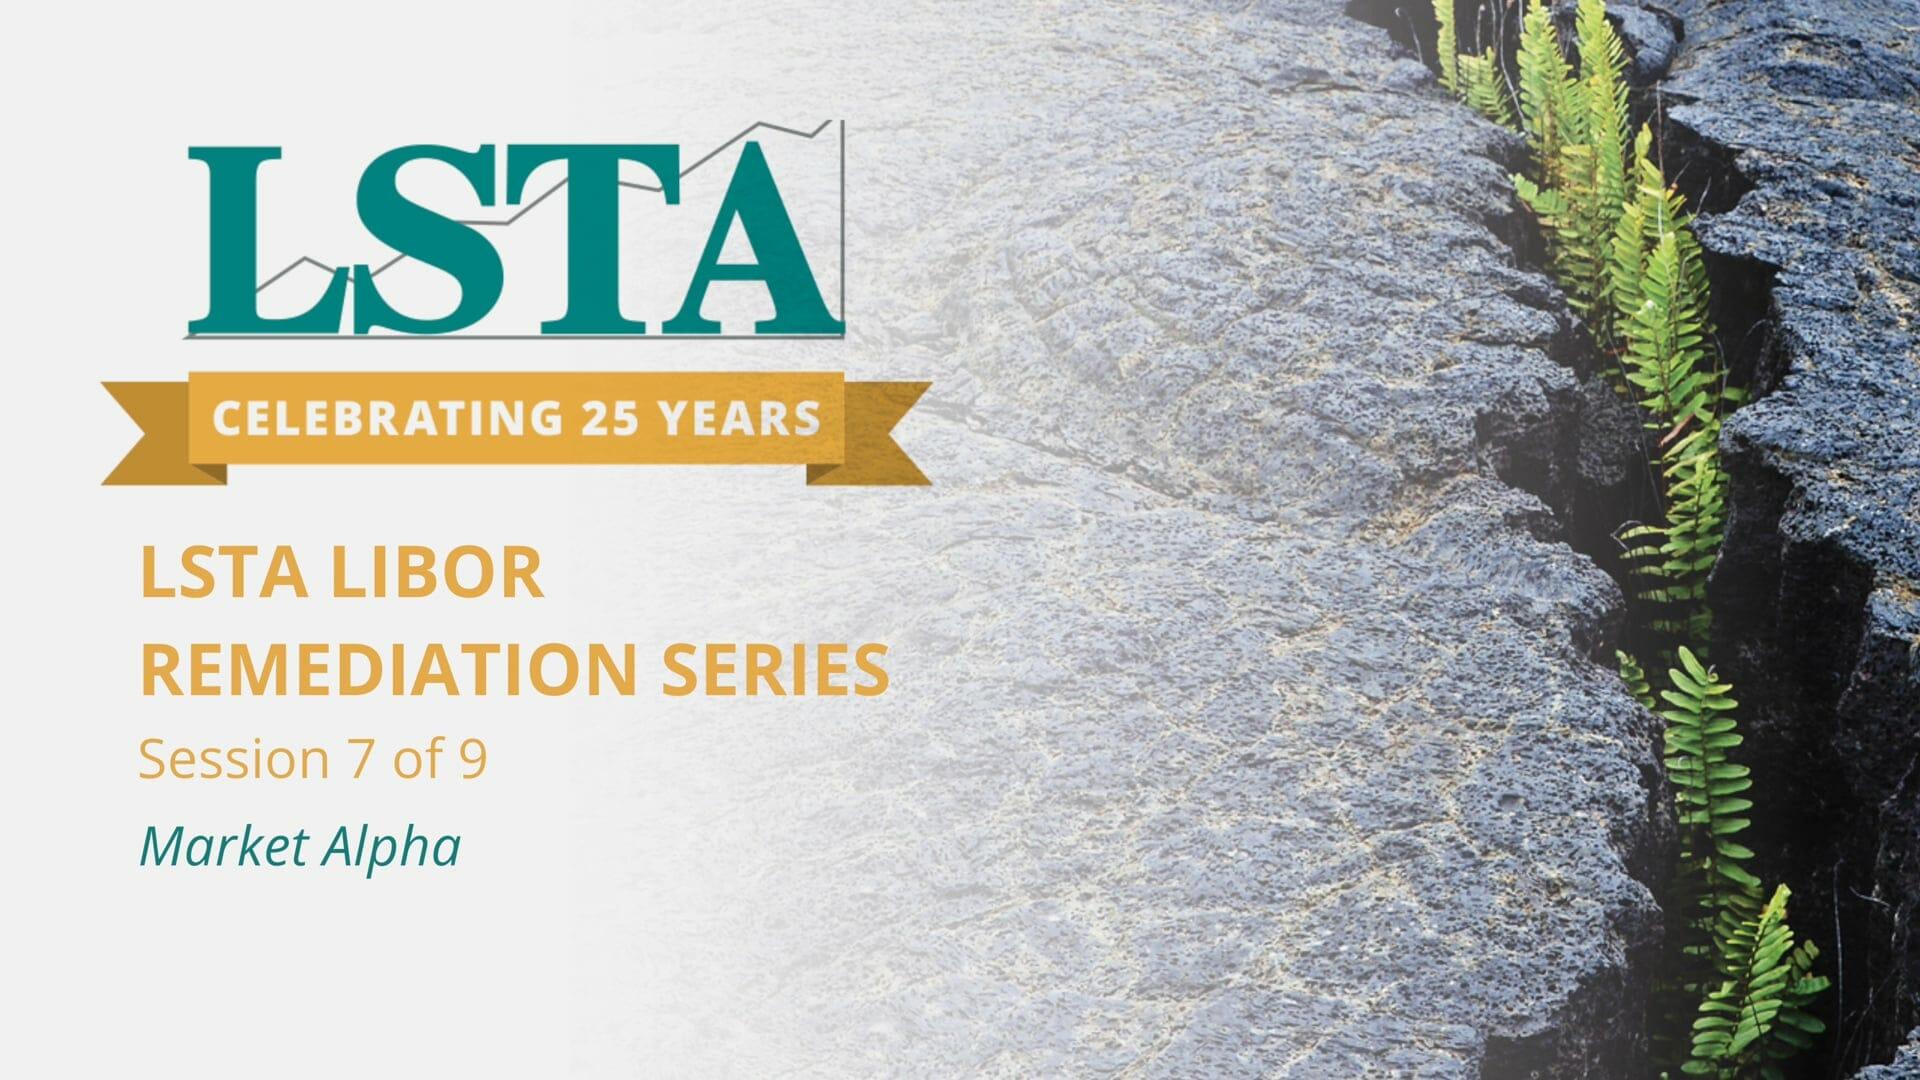 LSTA LIBOR Remediation Series Video – Market Alpha